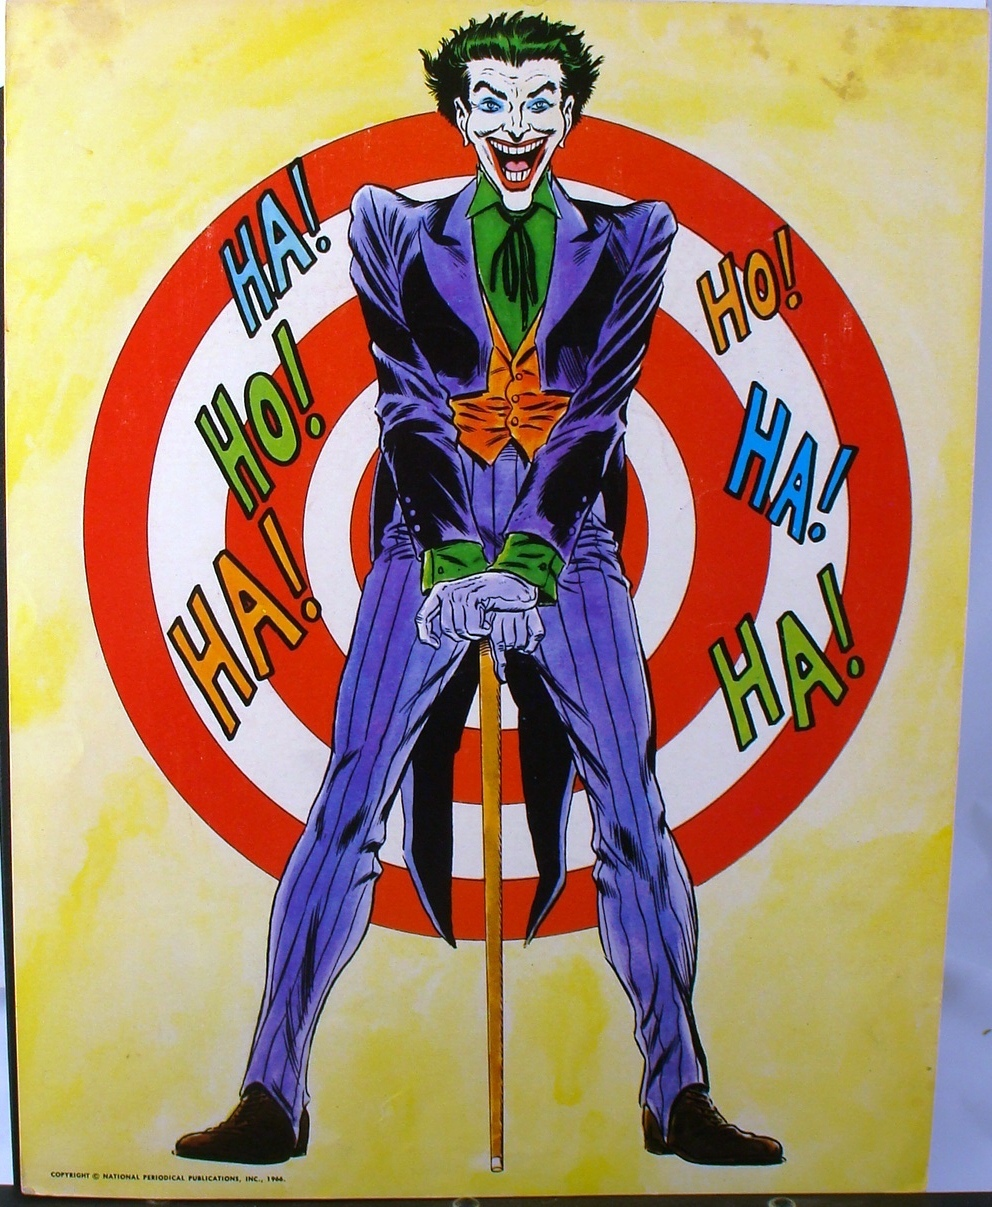 The classic Carmine Infantino Batman and Robin poster, plus the Joker. Joker Comic Poster